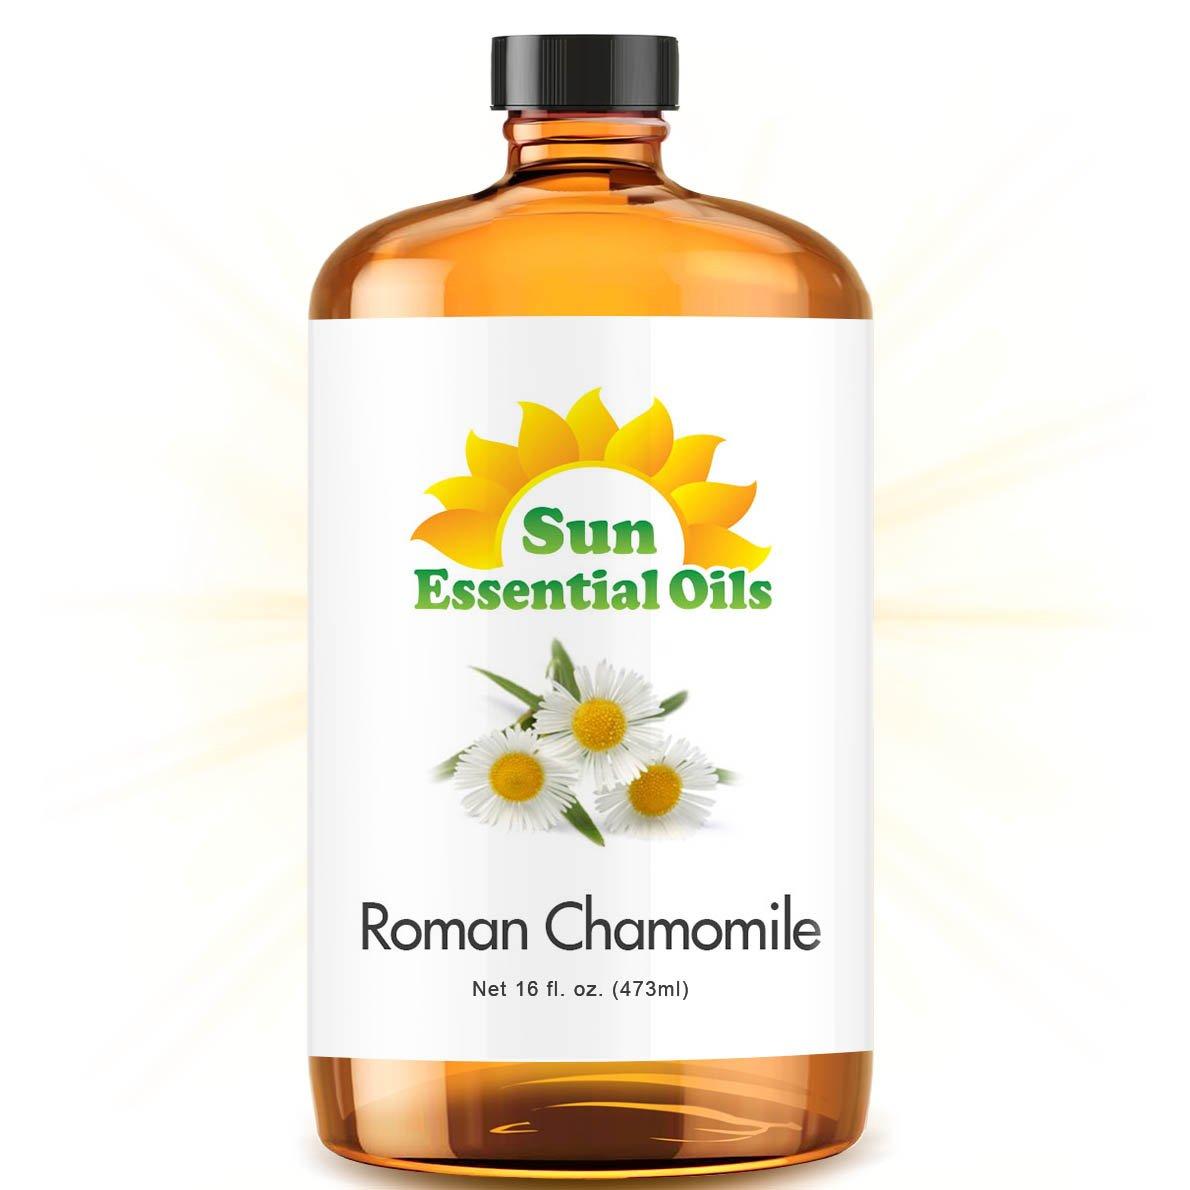 Bulk Chamomile (Roman) Oil - Ultra 16 Ounce - 100% Pure Essential Oil (Best 16 fl oz / 472ml) - Sun Essential by Sun Essential Oils